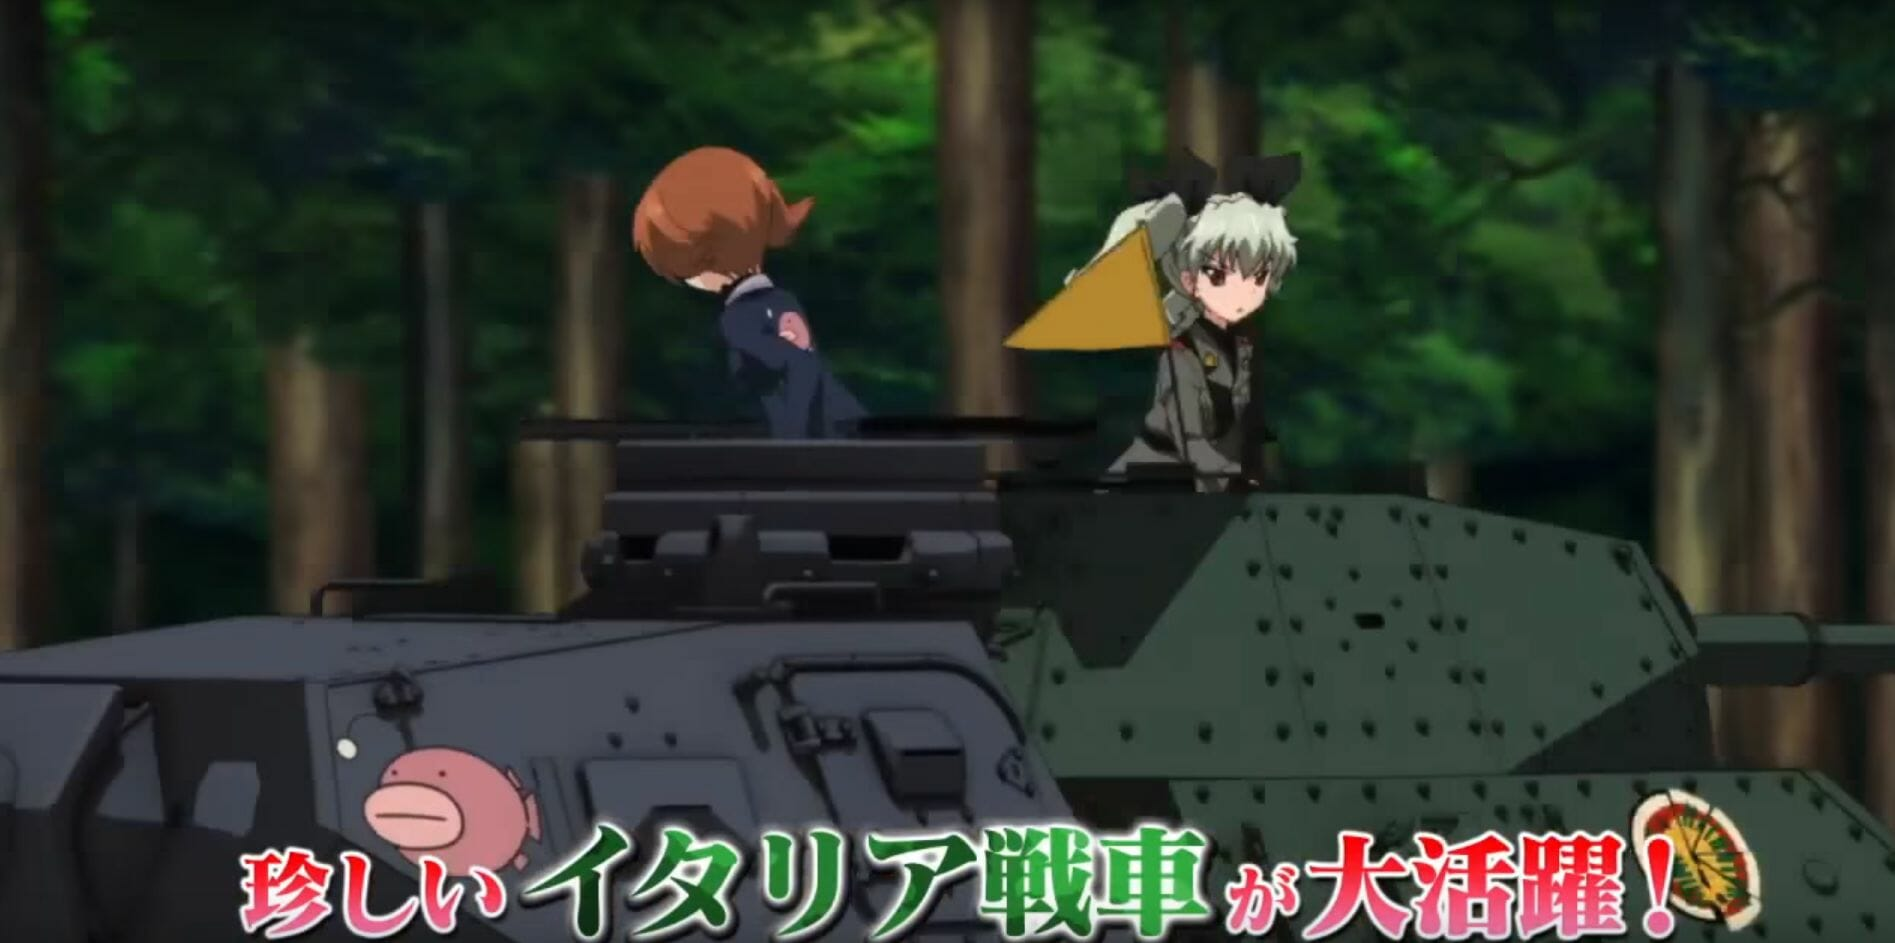 girls-and-panzer-2